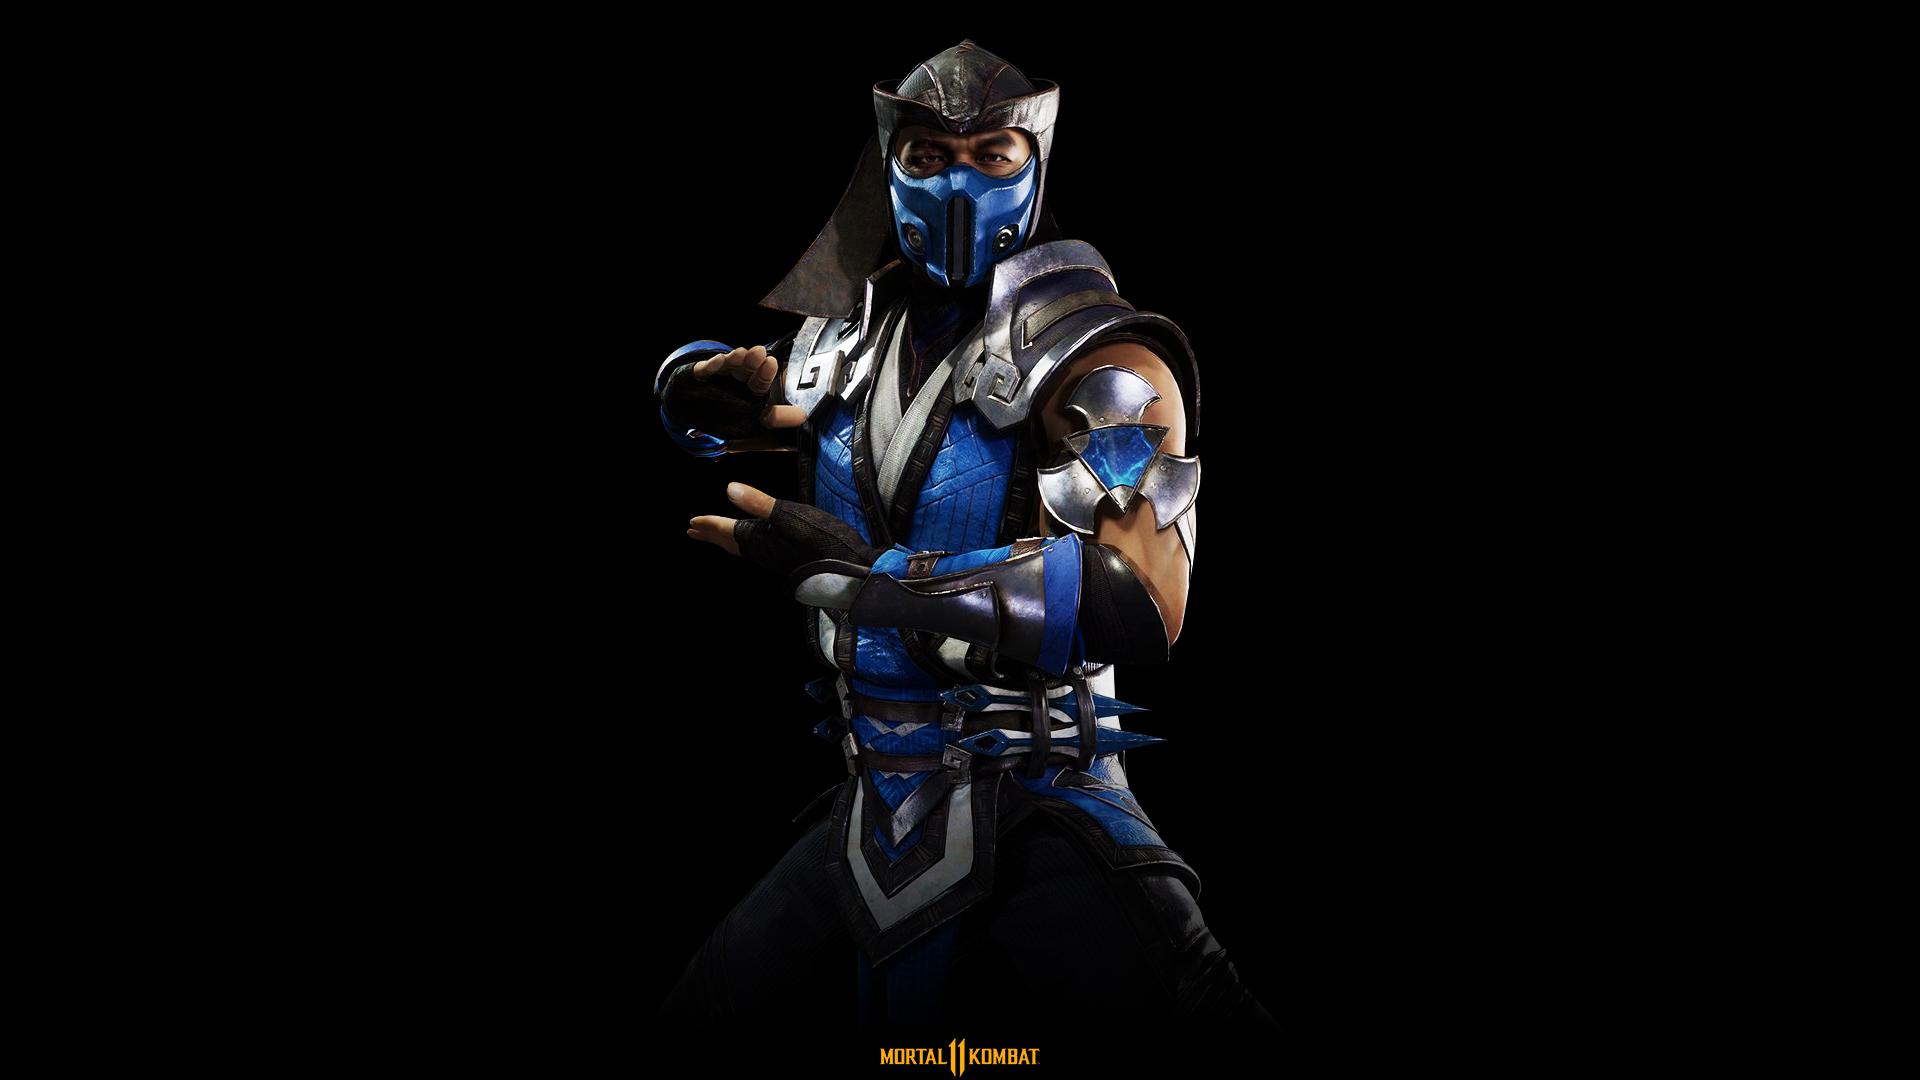 Wallpaper Mortal Kombat Mortal Kombat 11 Sub Zero Mortal